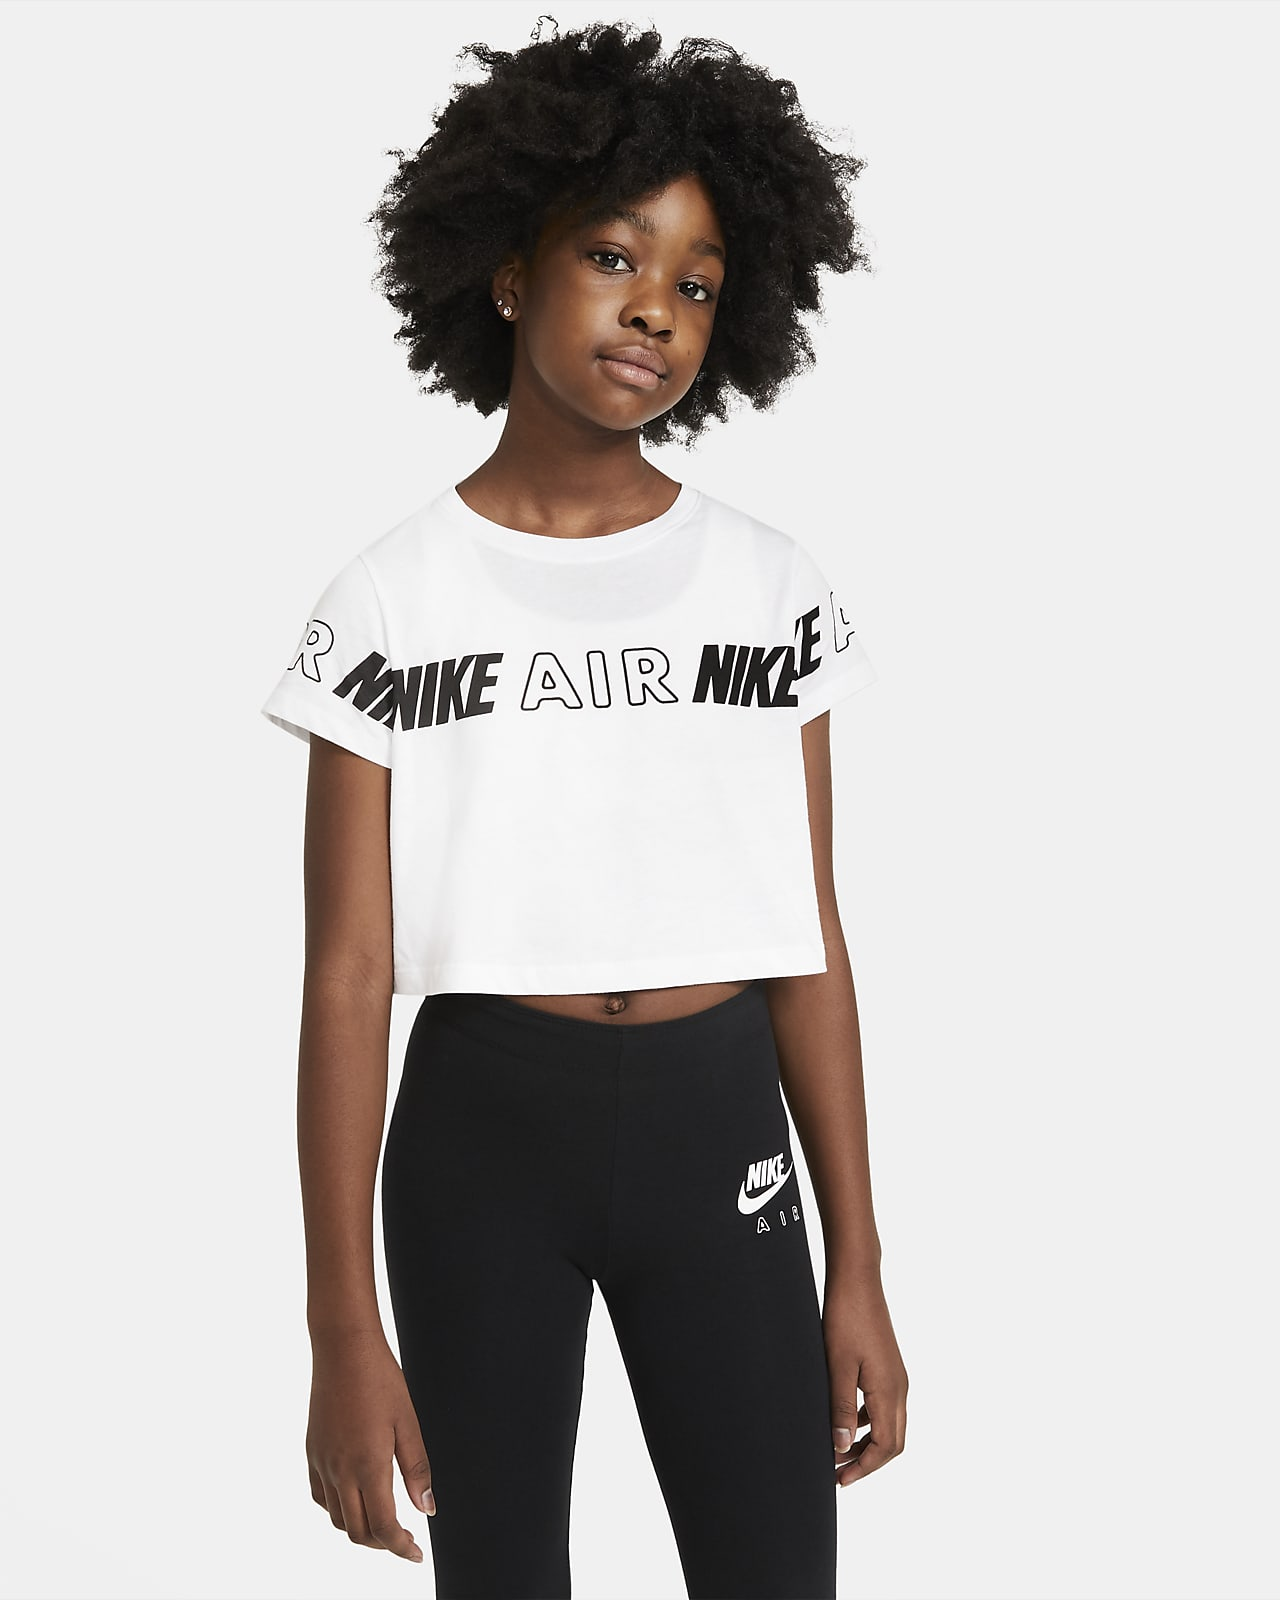 Nike Air Samarreta retallada - Nena